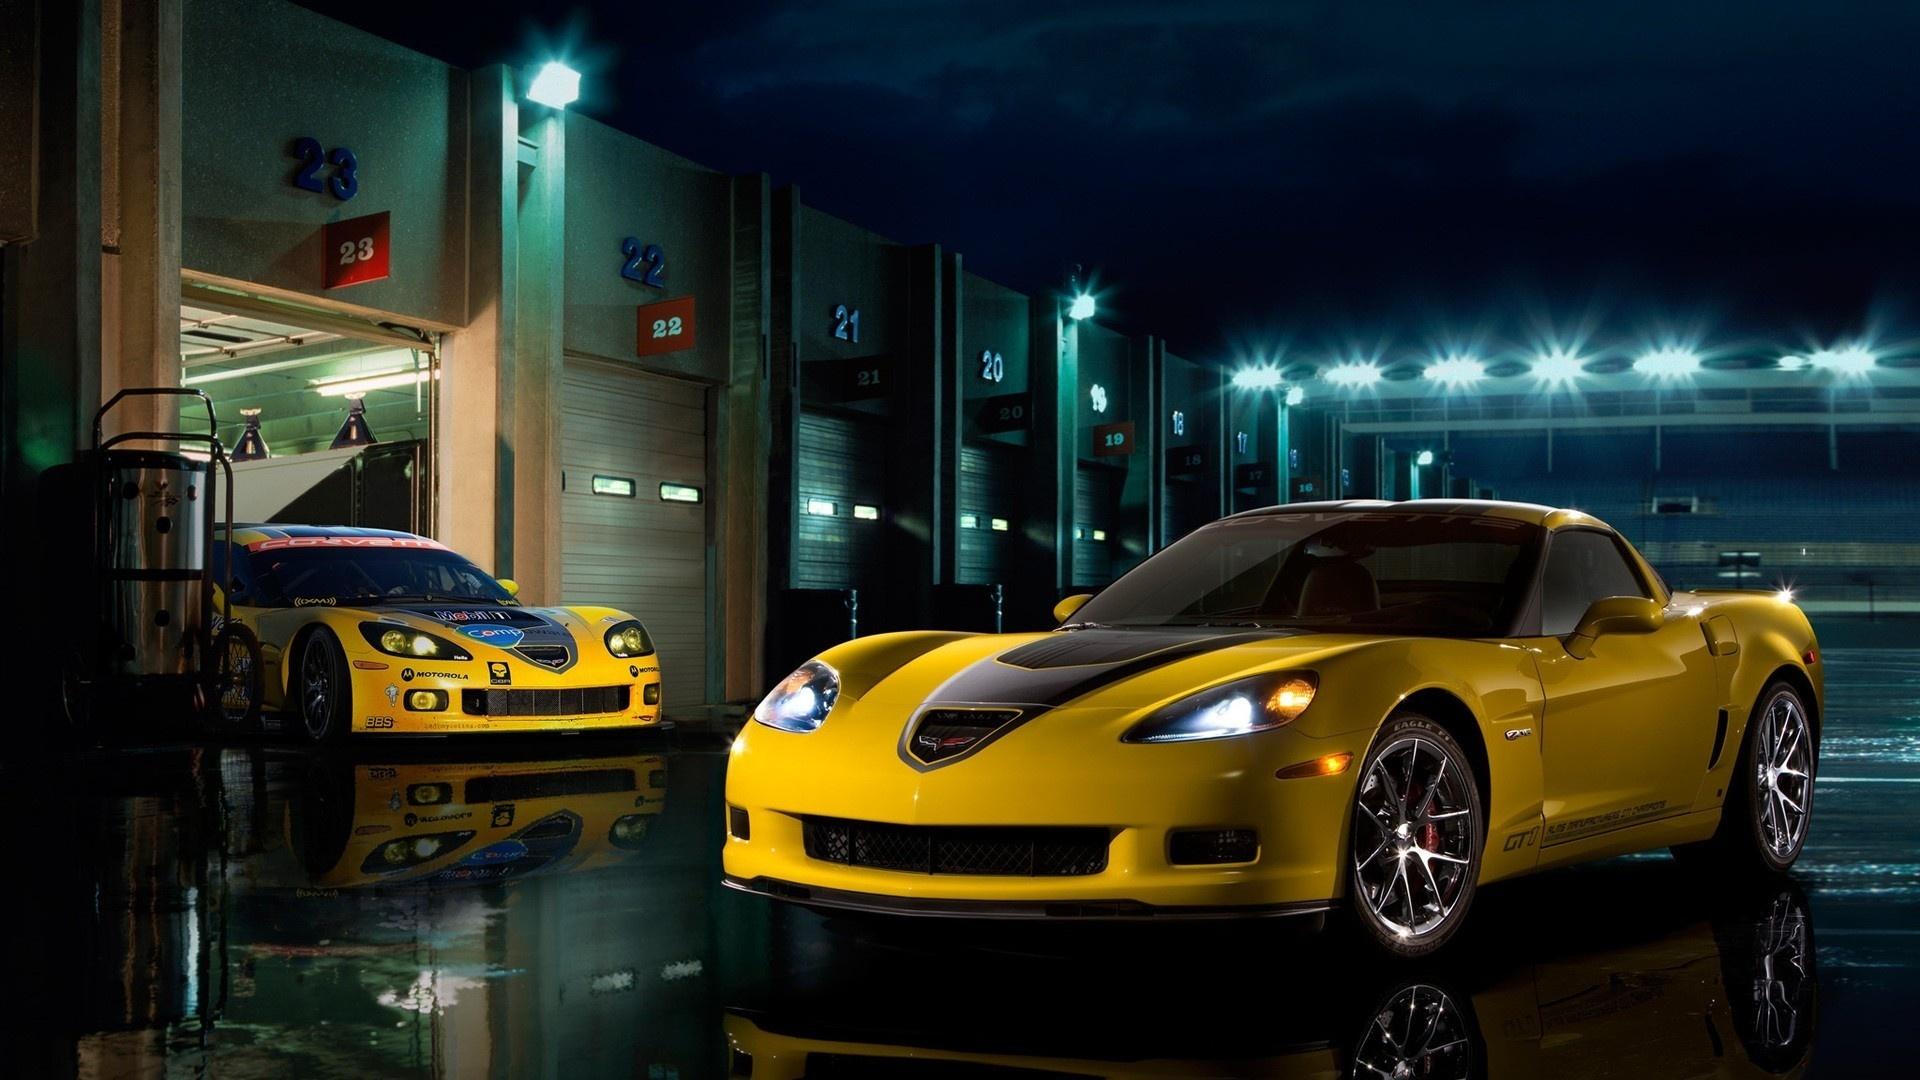 Corvette 1080p wallpaper